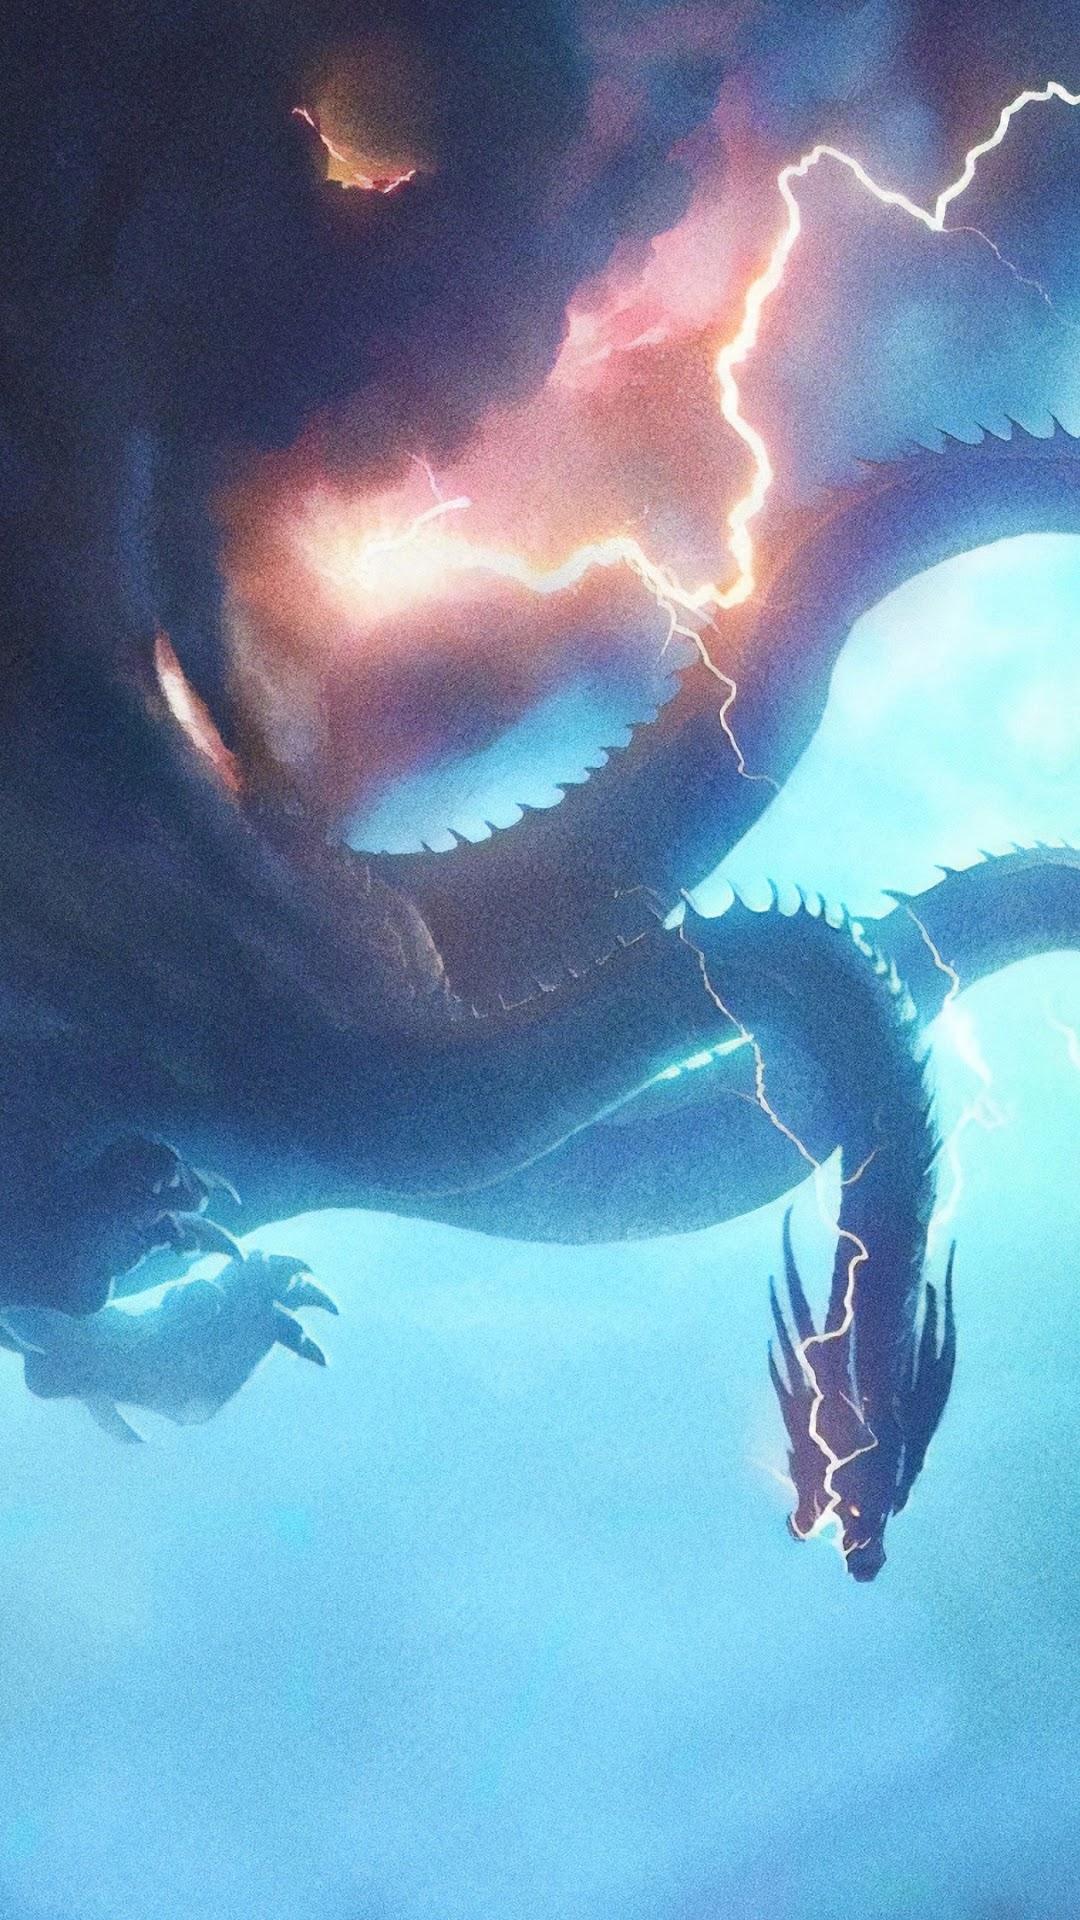 King Ghidorah Godzilla King Of The Monsters 4k Wallpaper 17